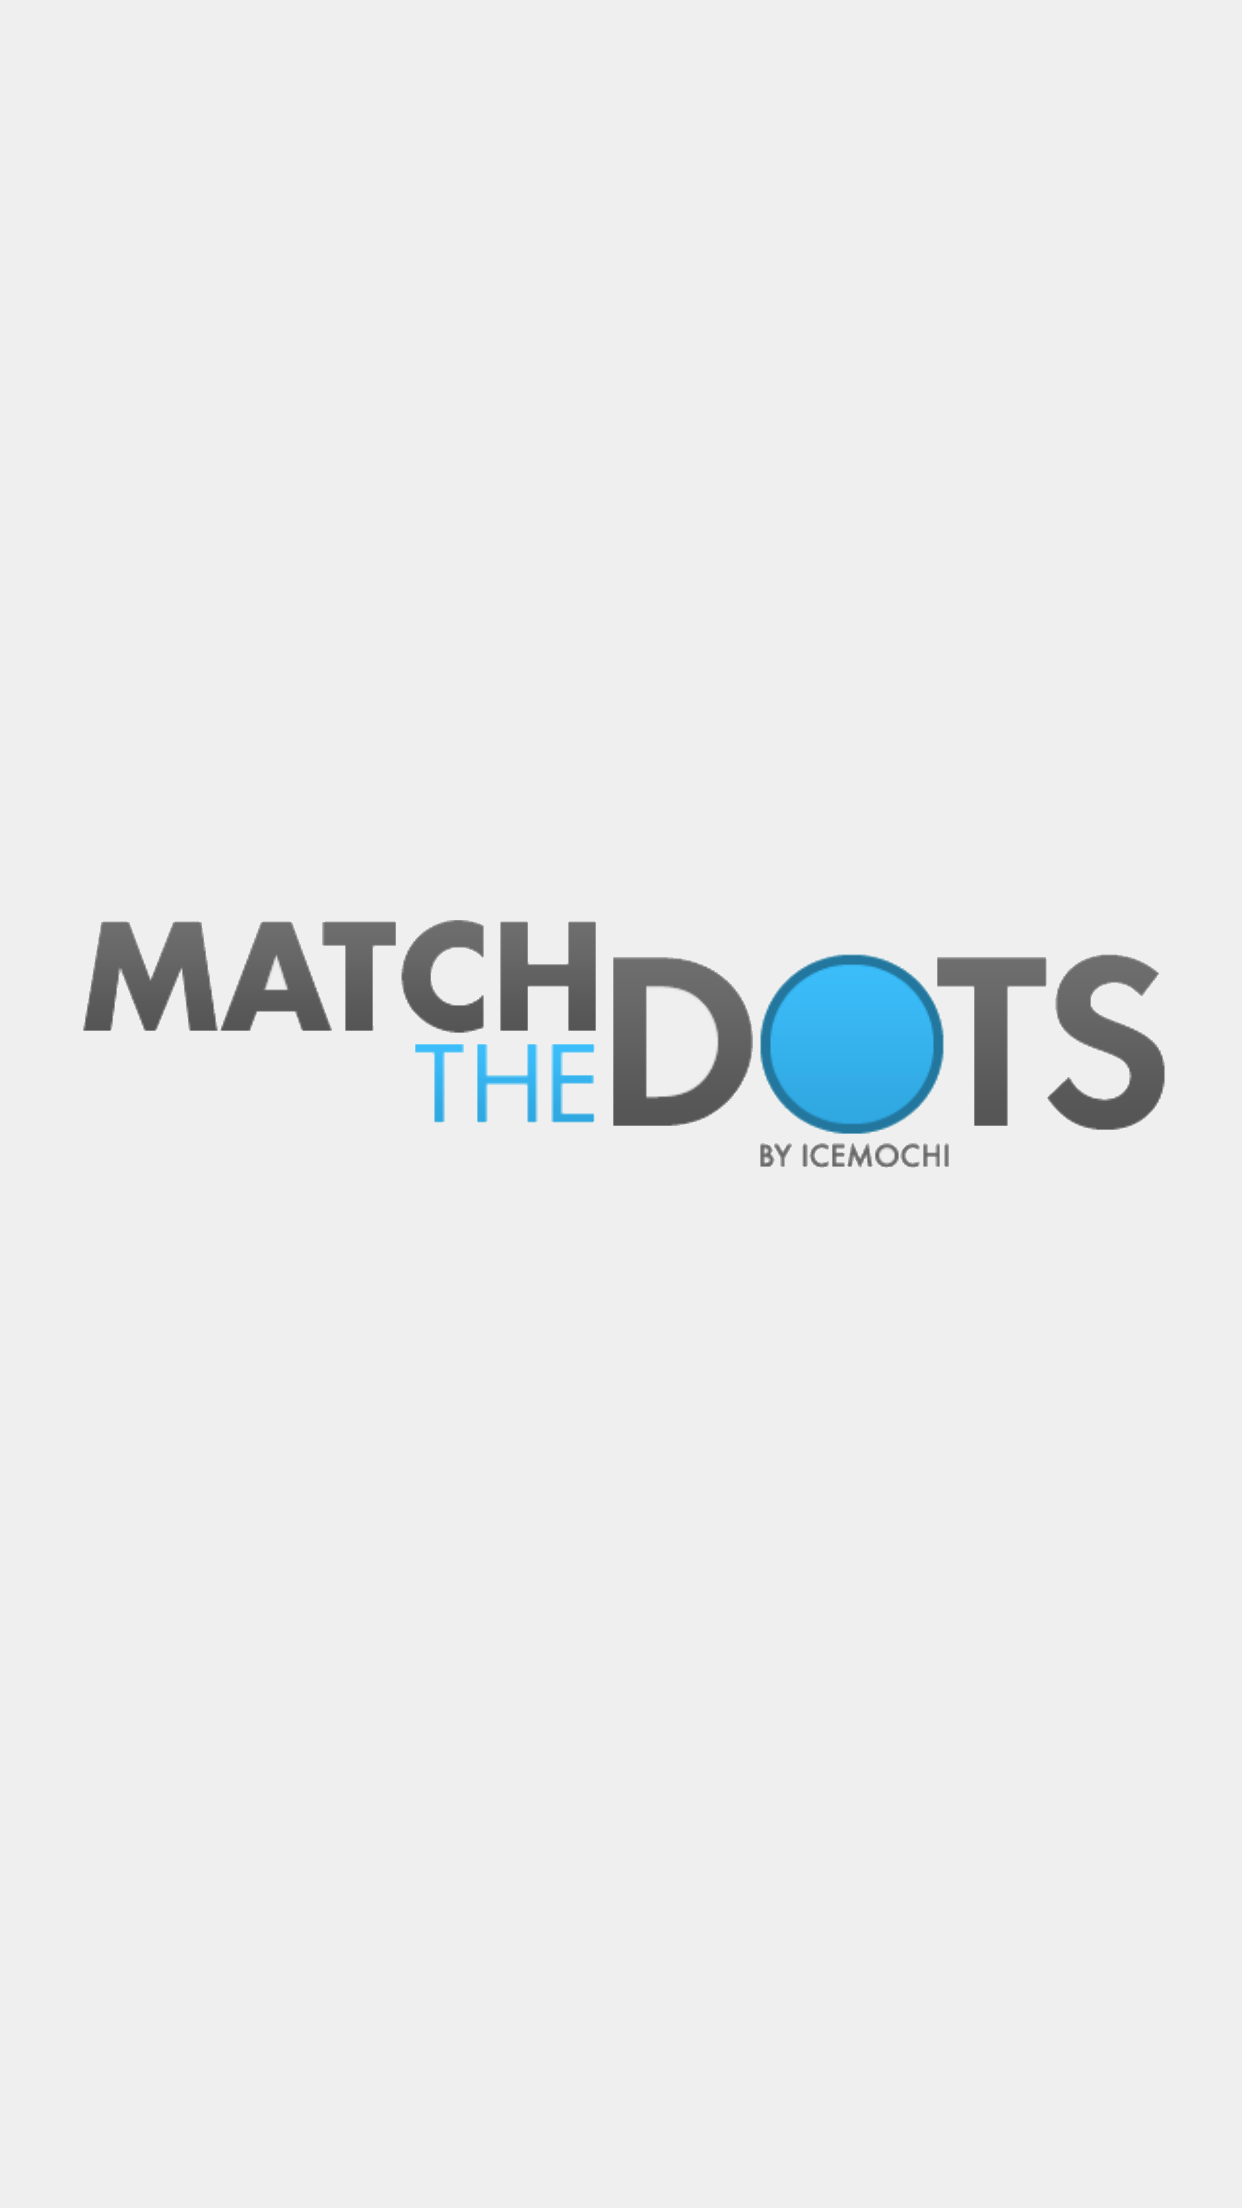 Match the Dots by IceMochi Screenshot